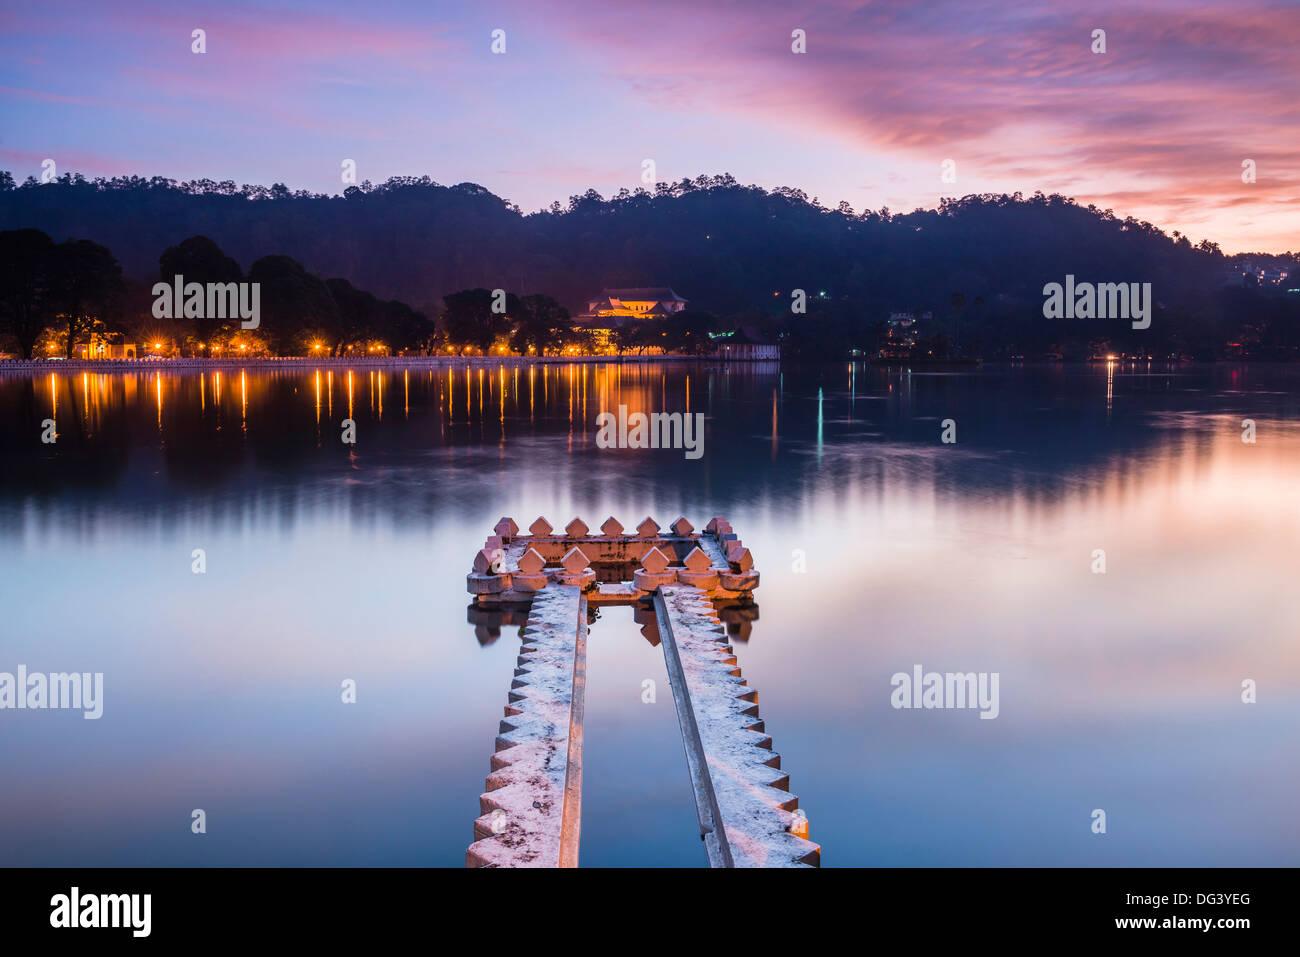 Al amanecer Lago Kandy, Kandy, Sri Lanka, la Provincia Central, Asia Imagen De Stock